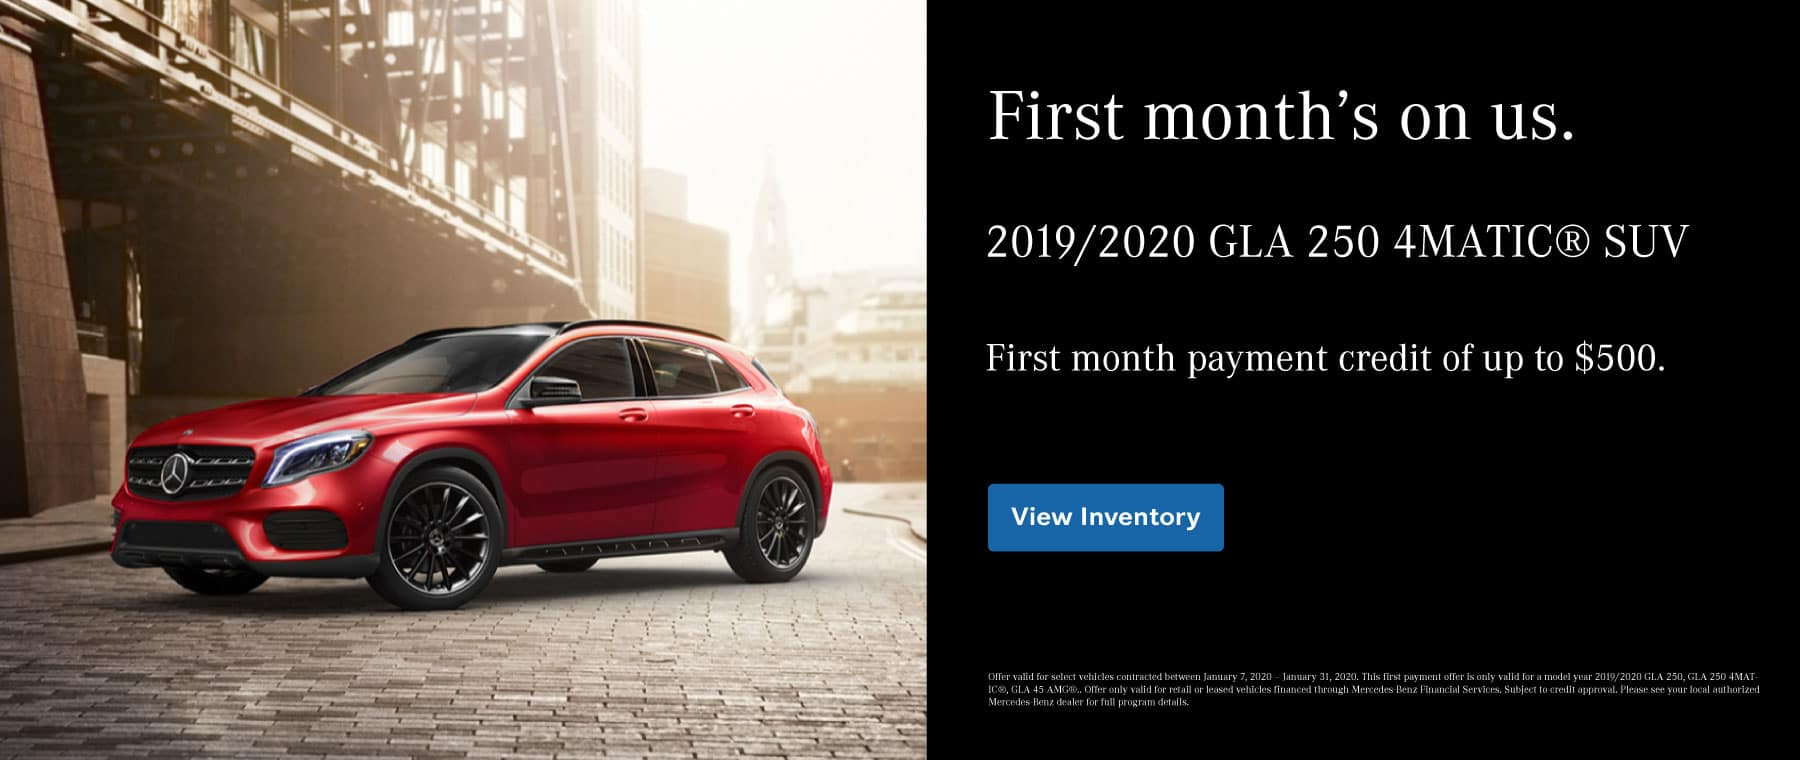 GLA Payment Credit